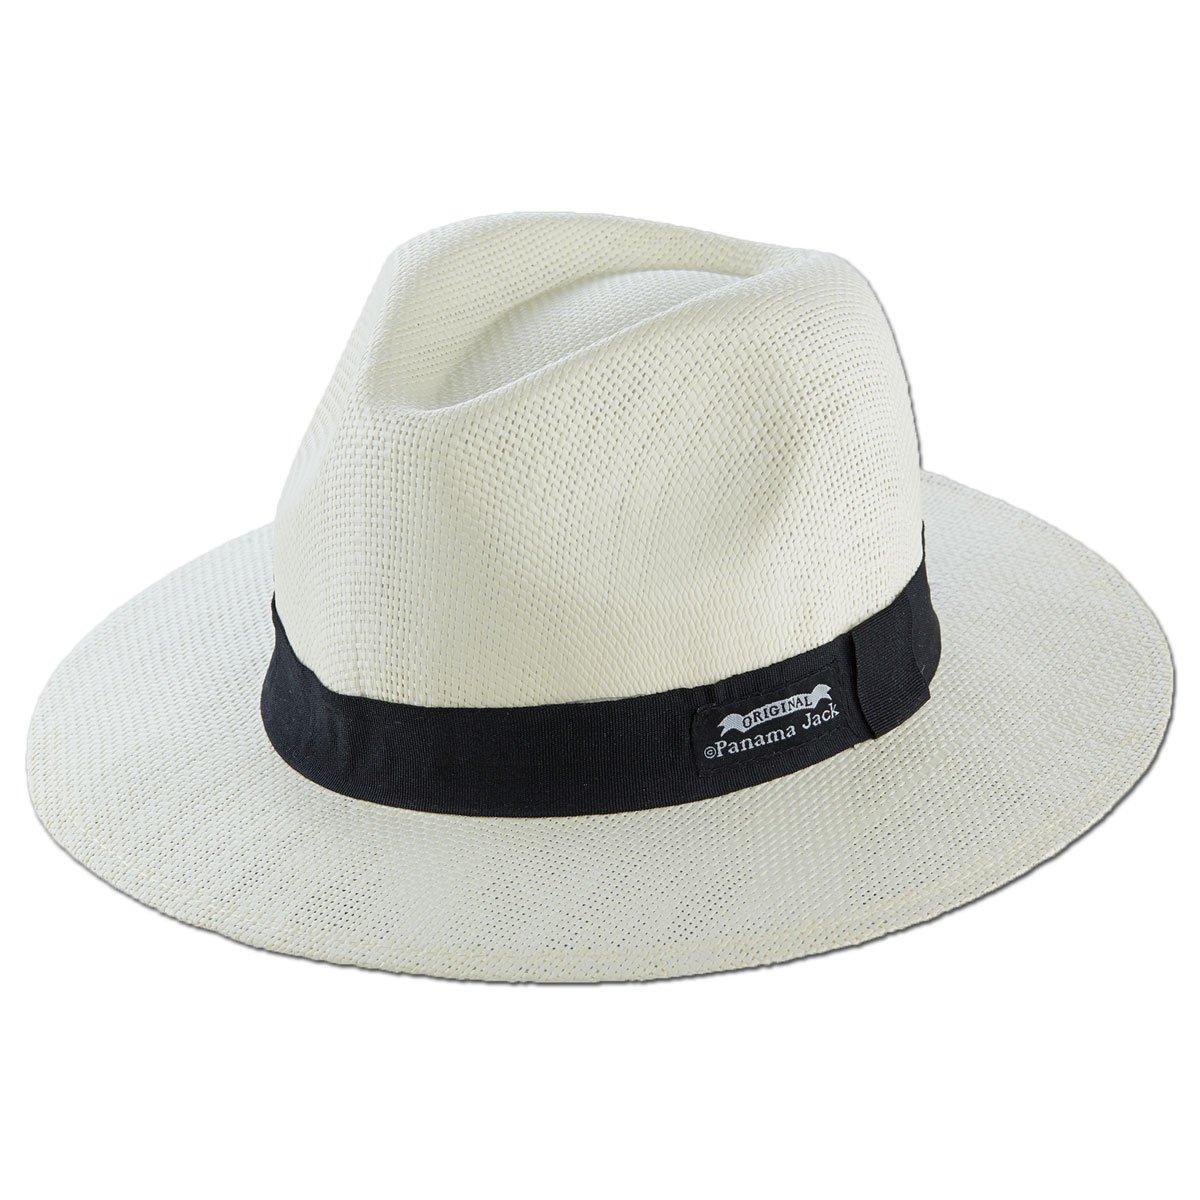 156b6b43b Original Panama Jack The Matte Toyo Straw Sun Safari Hat: Amazon.ca ...